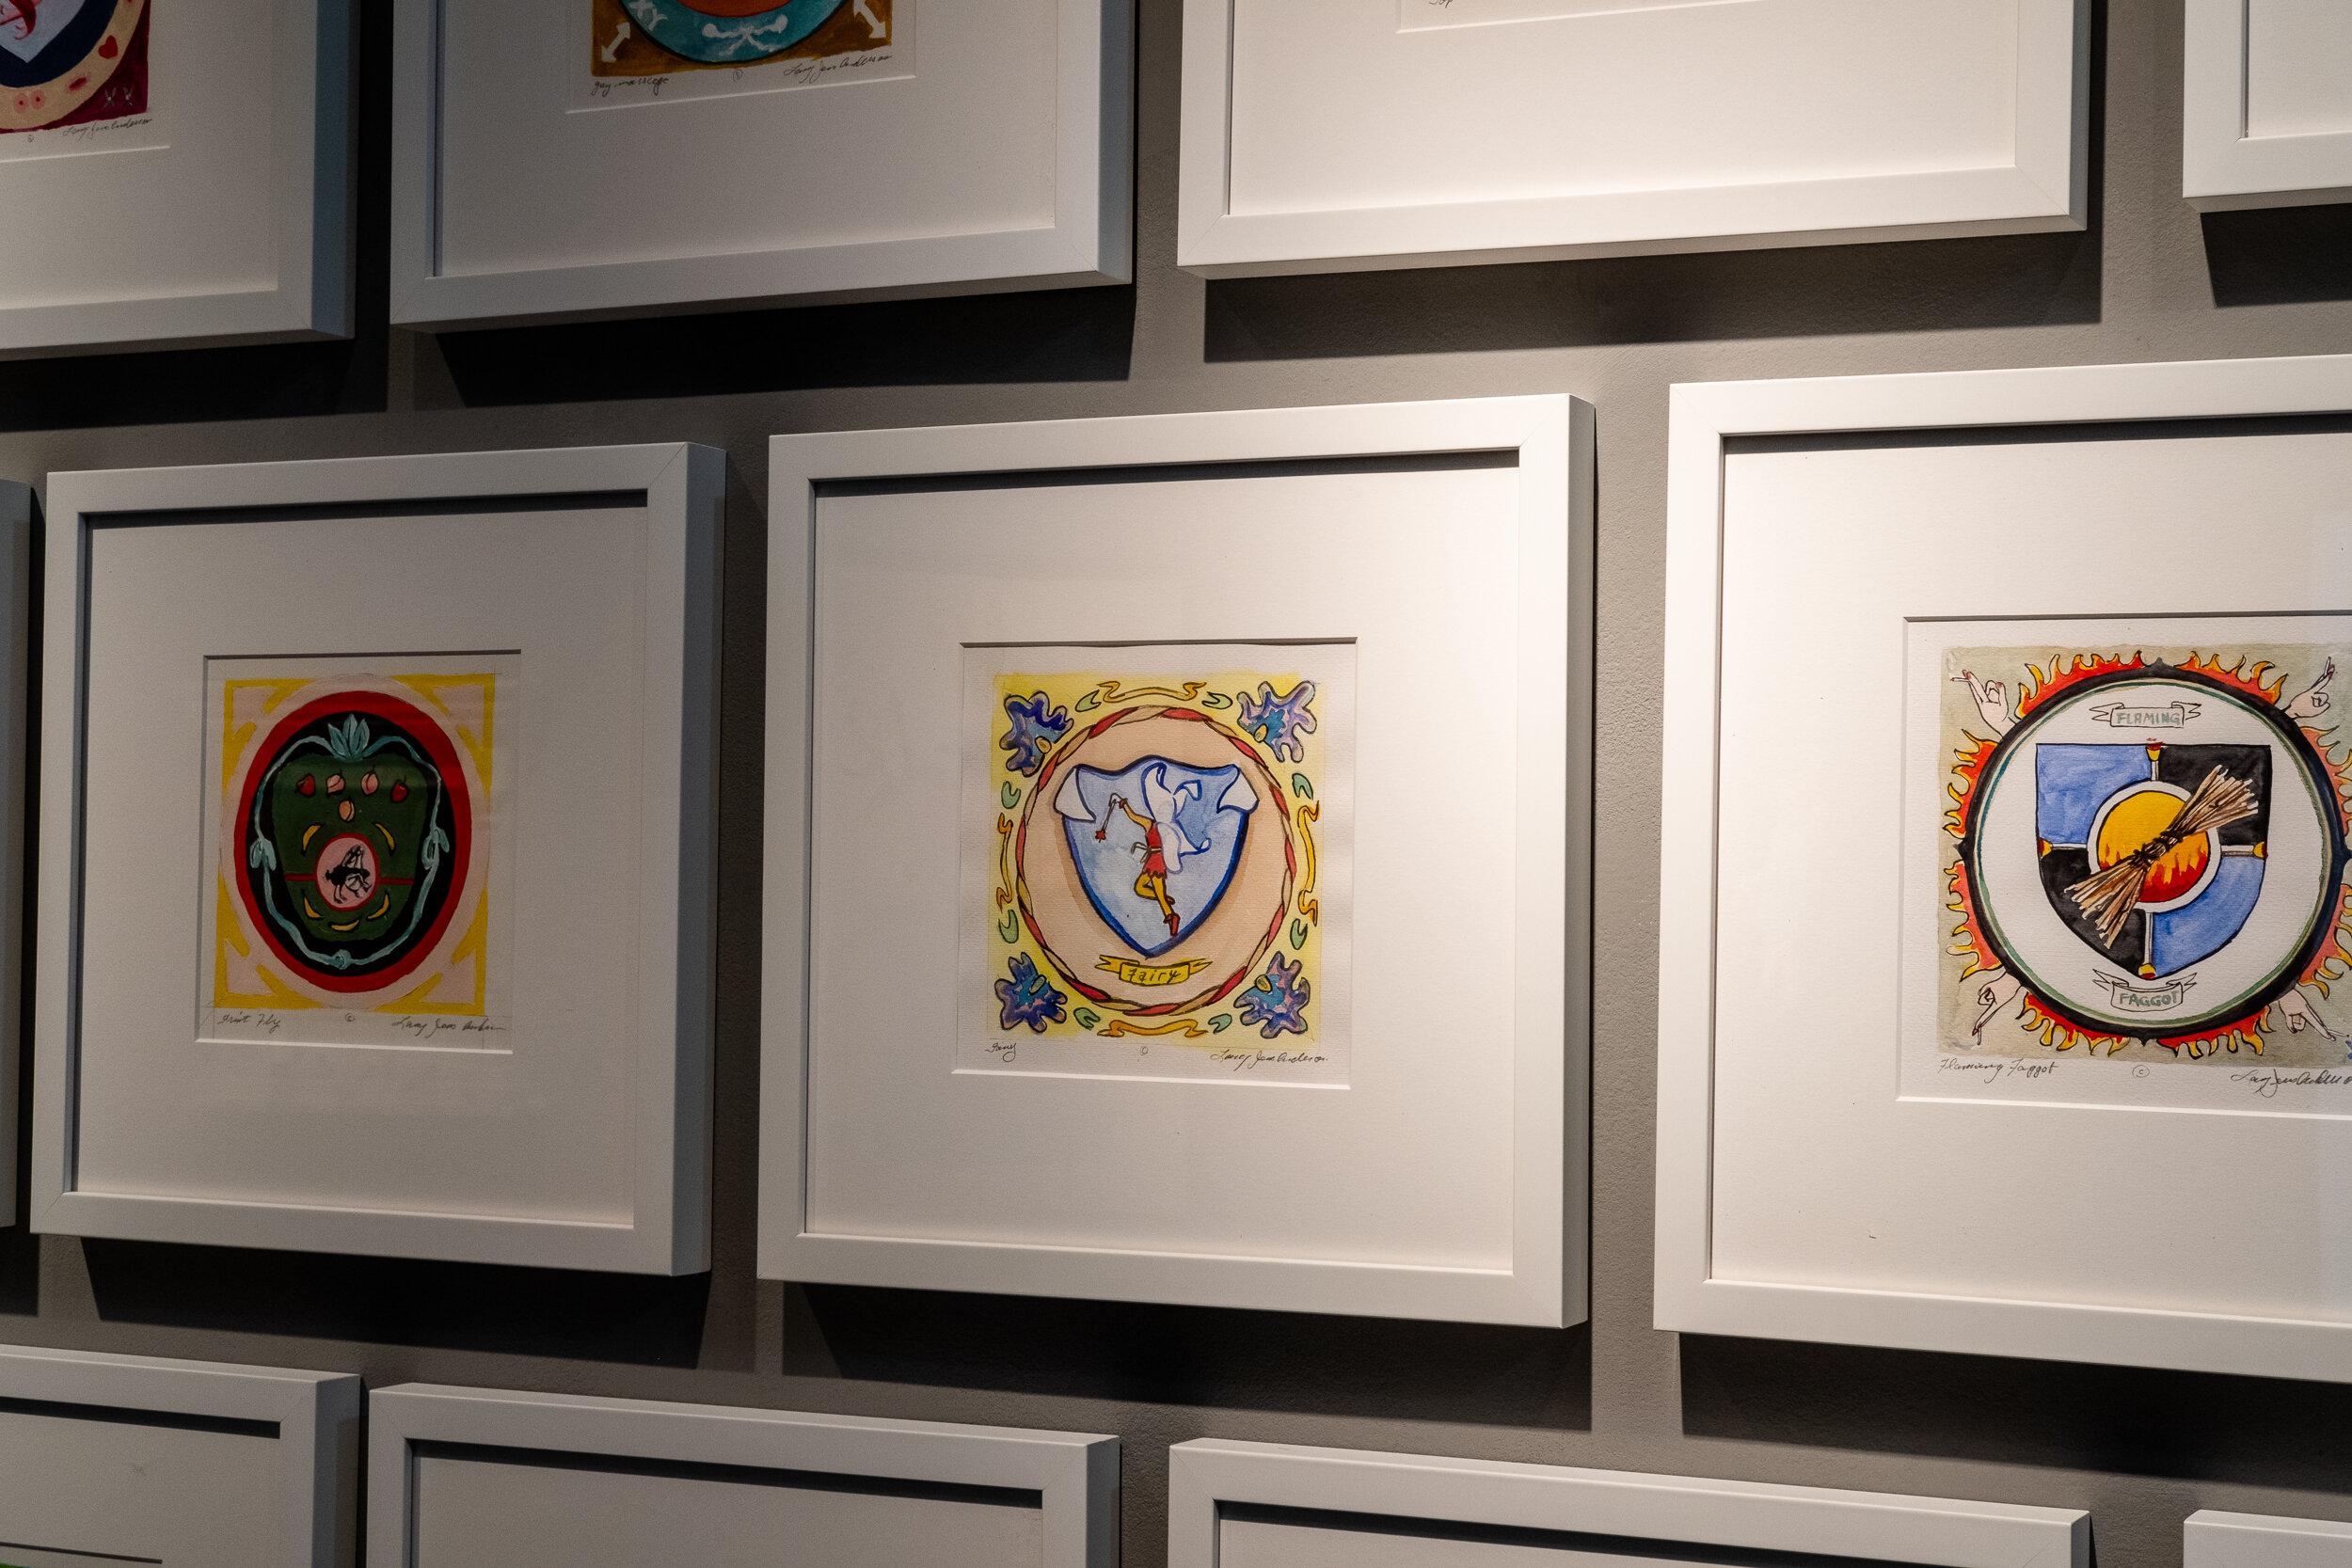 Passage   framed watercolors {original} 14.25 x 14.25 inches LJA 256G